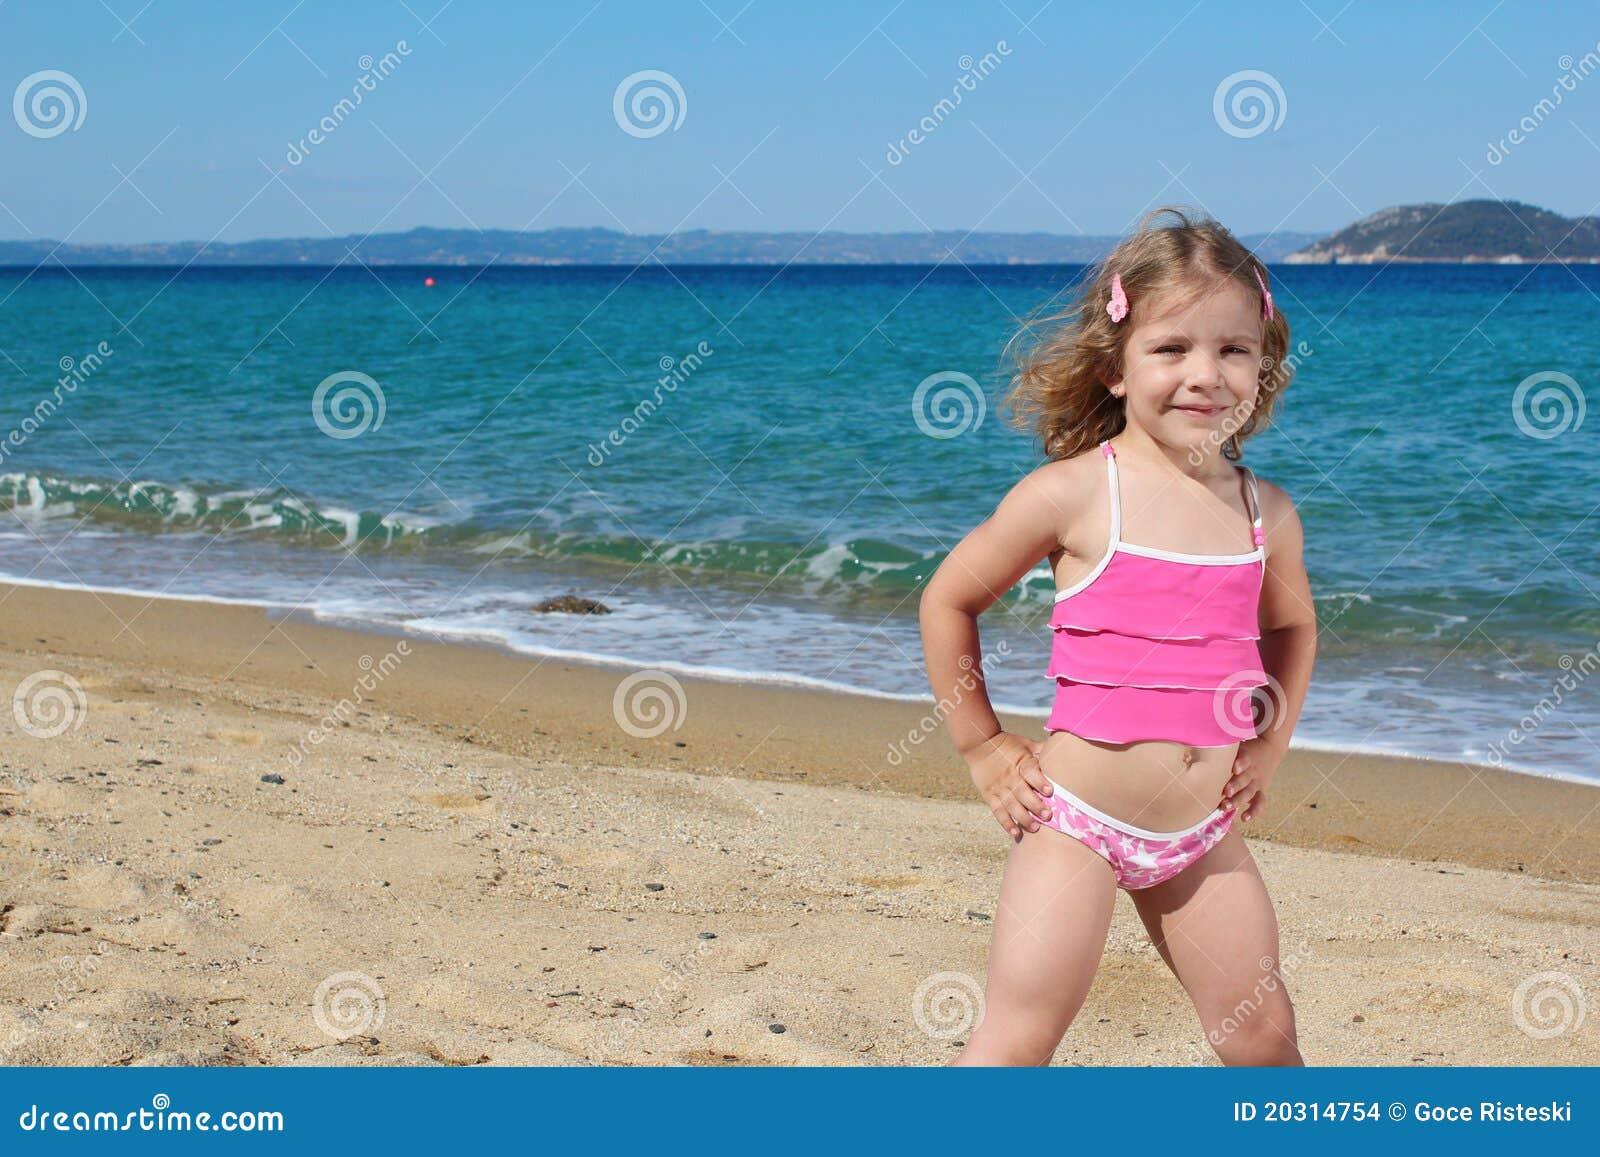 little girl pose beach